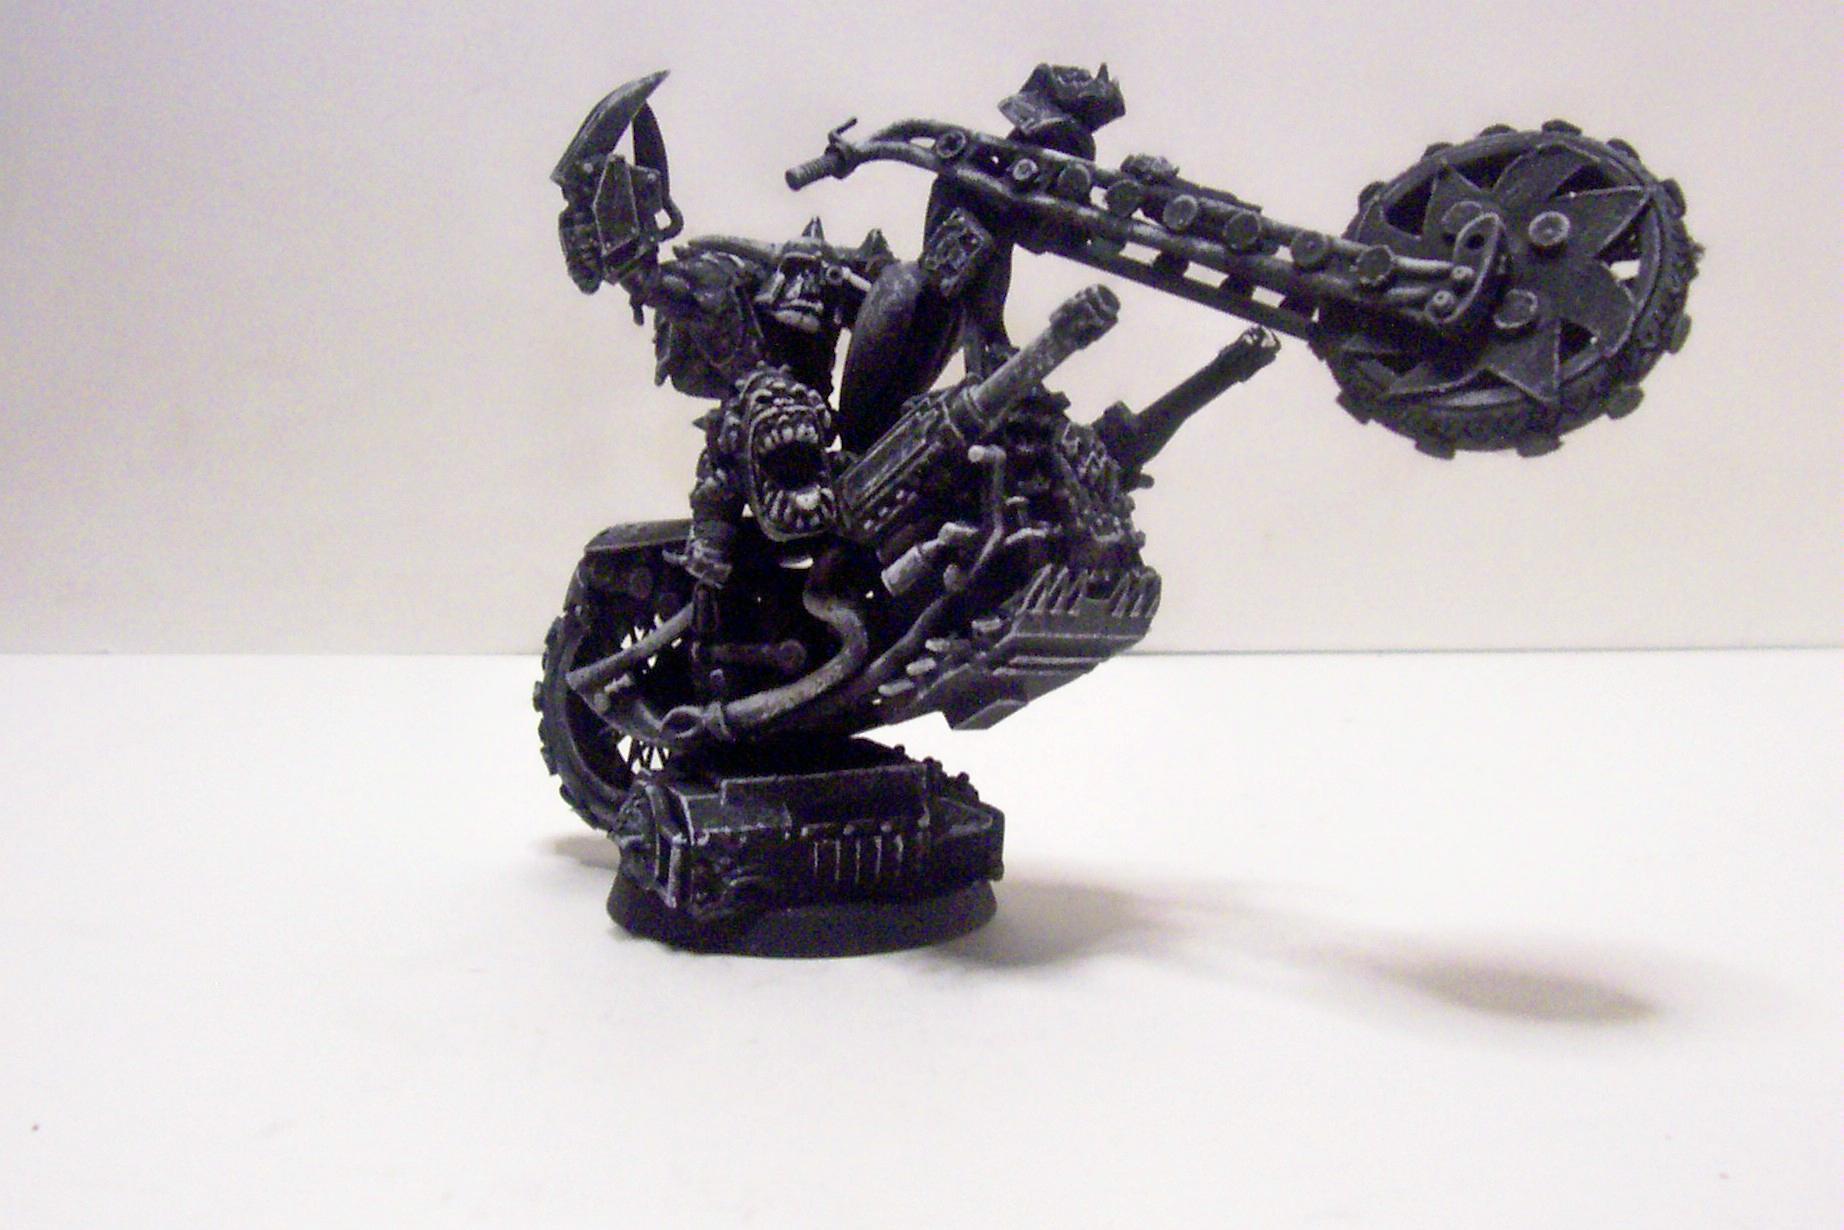 Bike, Conversion, Orks, Warboss, Warhammer 40,000